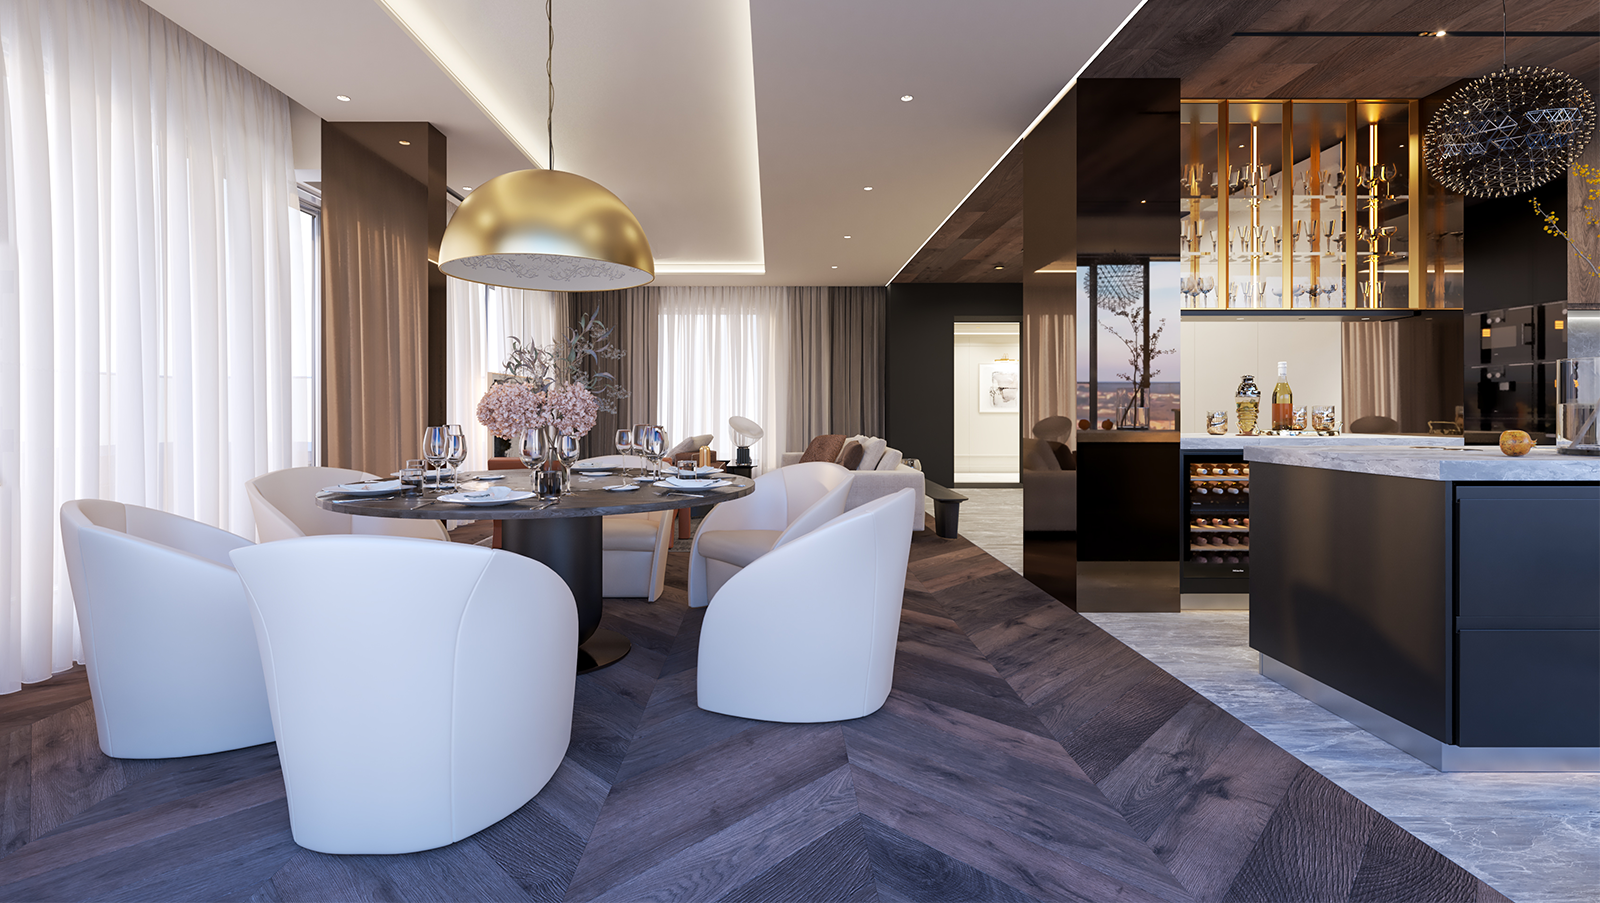 Магнолия проект - интериорен дизайн на тристаен апартамент